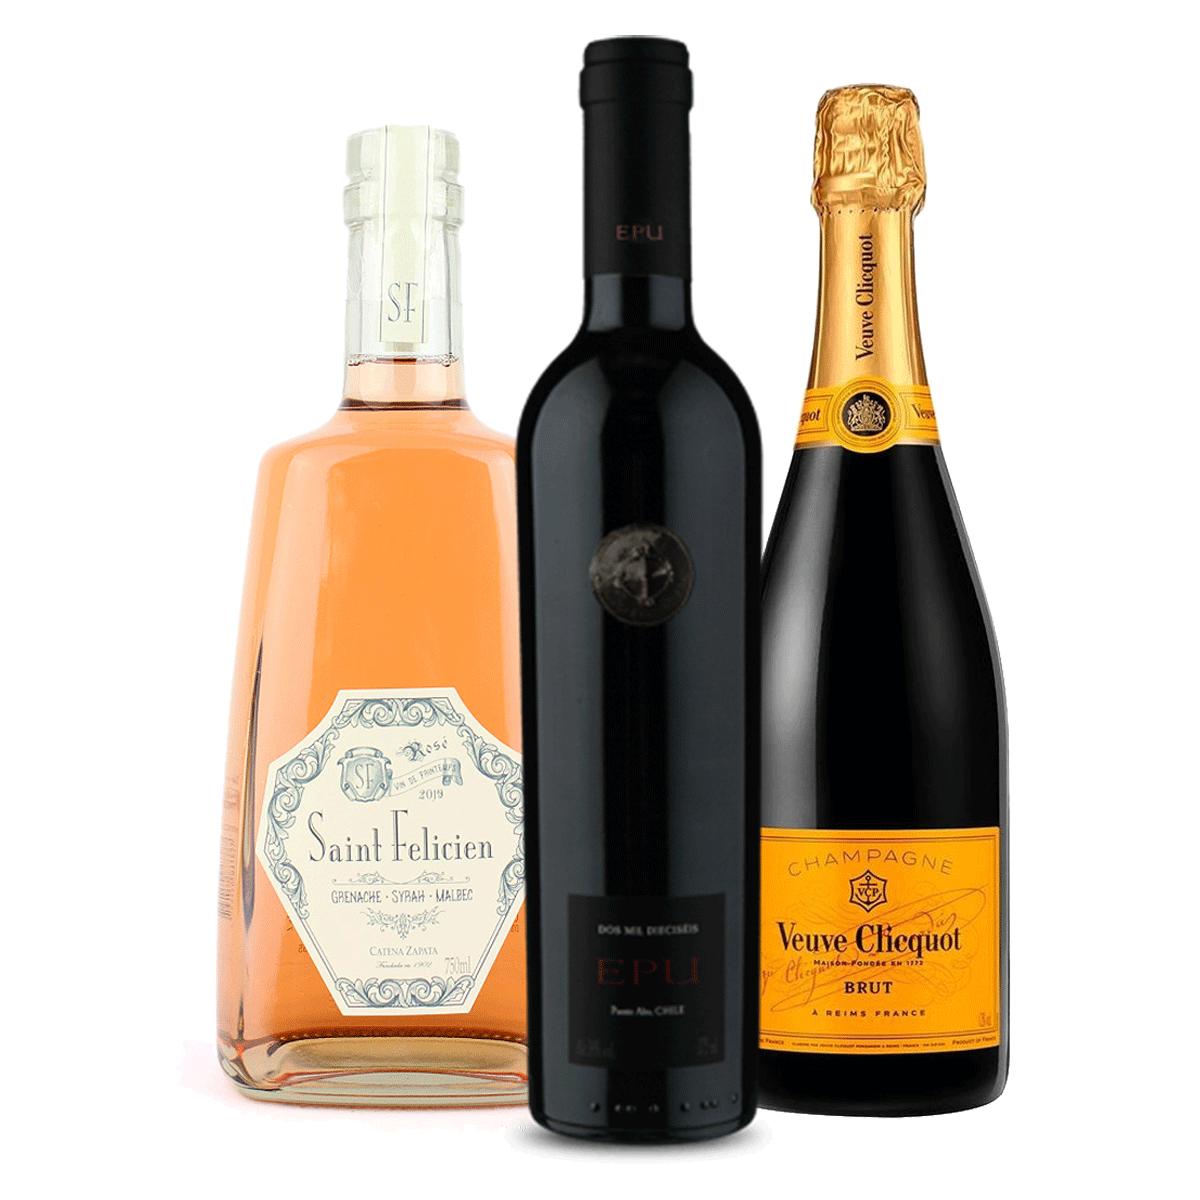 Kit 1 Champagne Veuve Clicquot 750ml + 1 Saint Felicien Rose 750ml + 1 Vinho Almaviva EPU 750ml